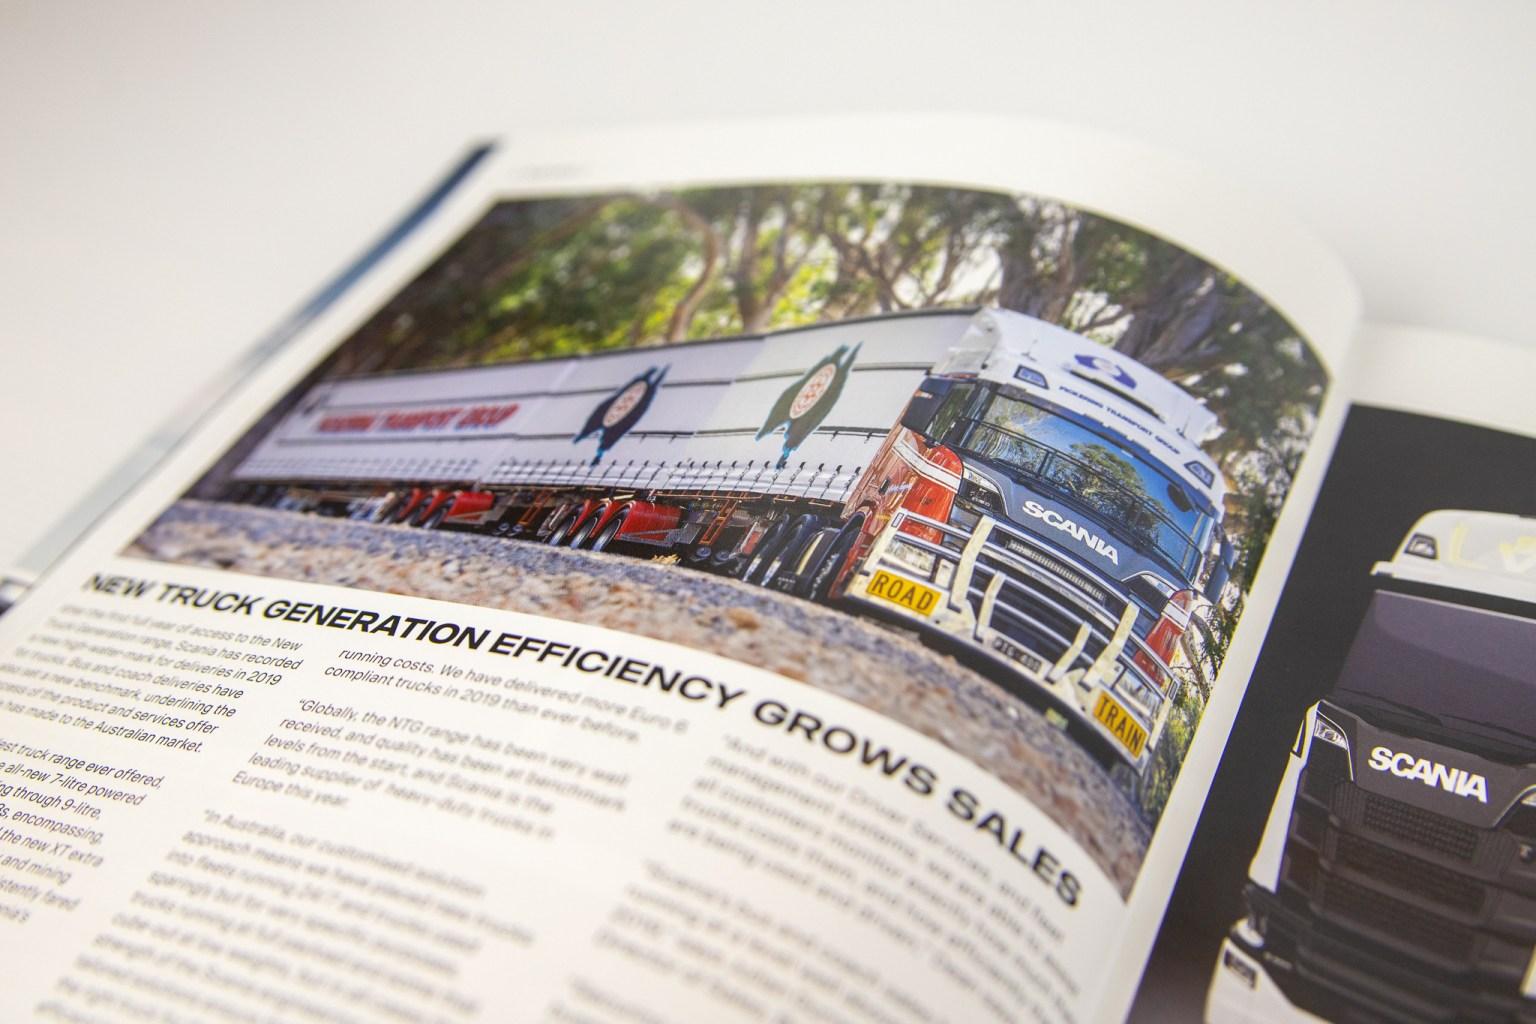 Scania,Pickering Transport Group, trucks, b-triple